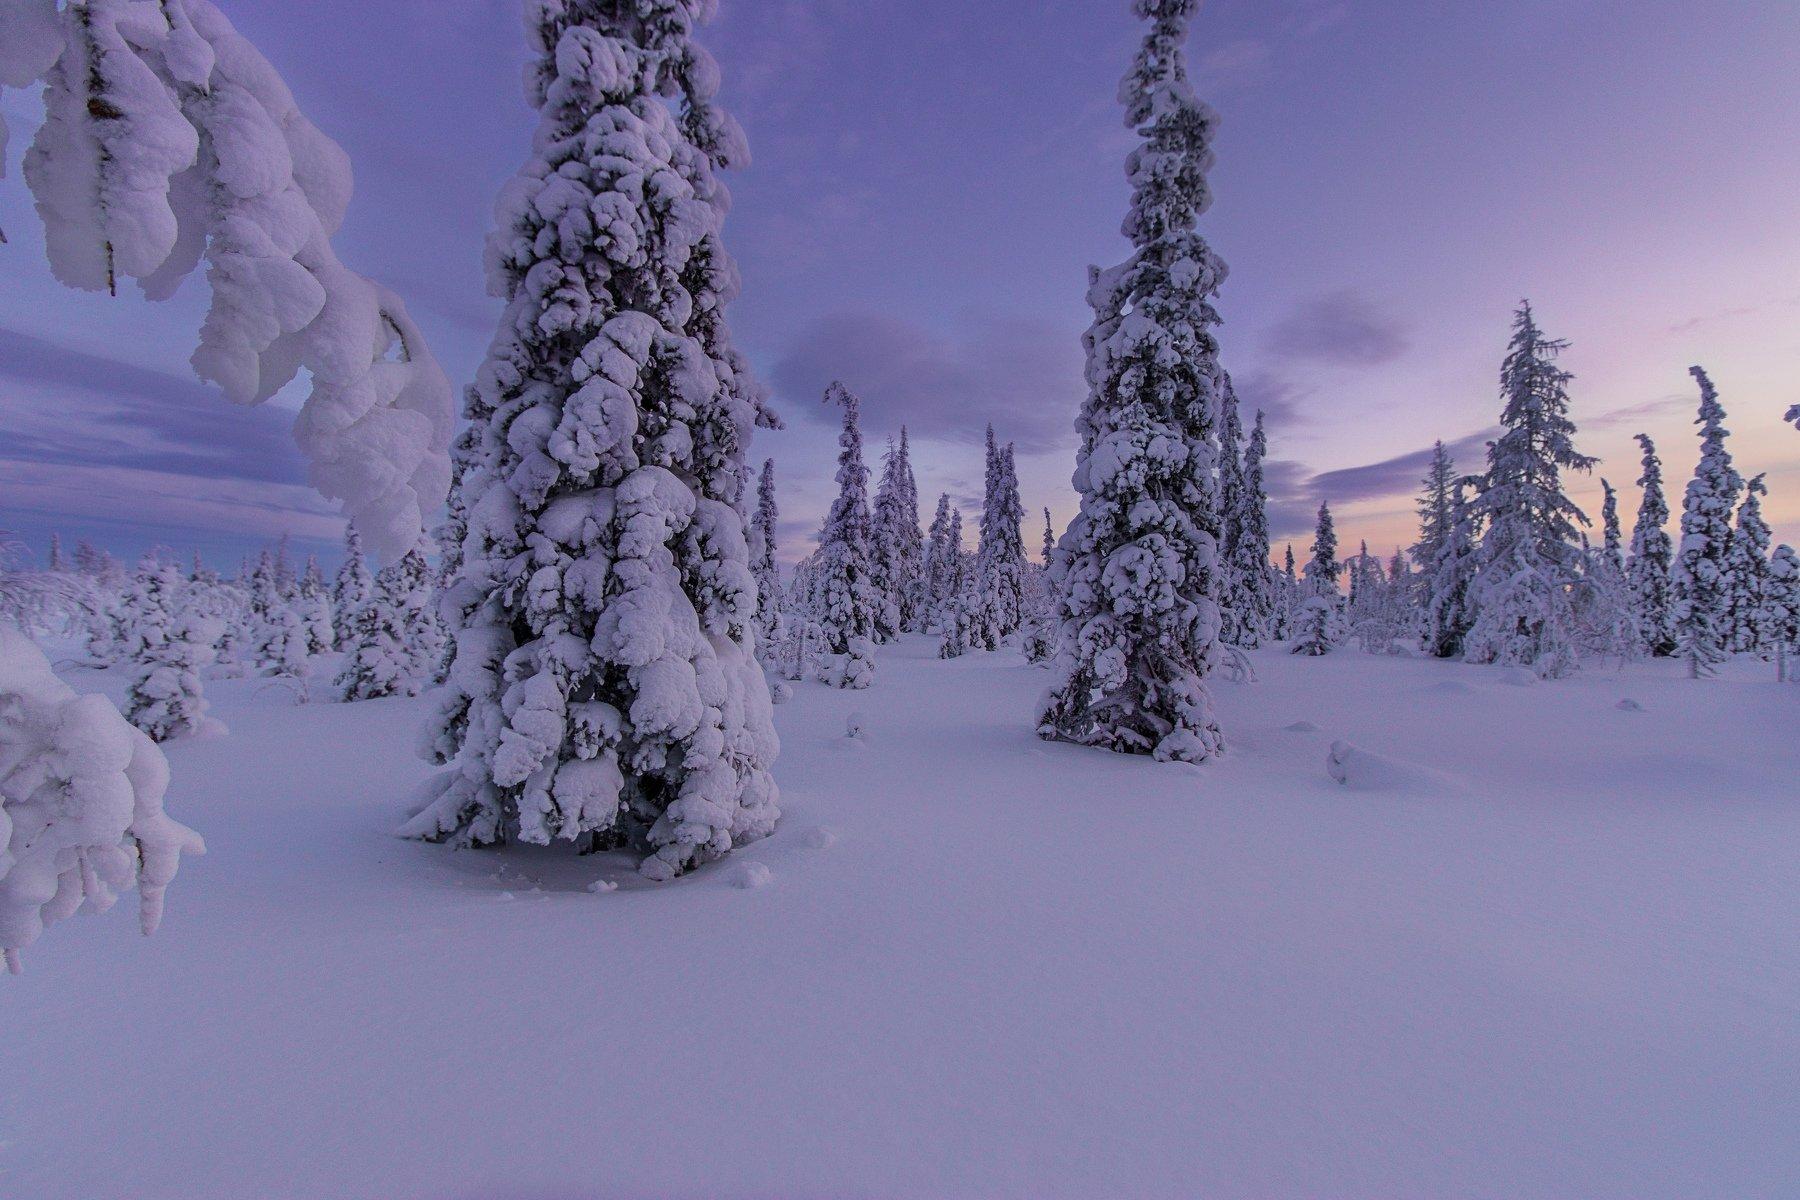 ямал , зима , природа, салехард , декабрь,  январь ,север, Братцева Анастасия